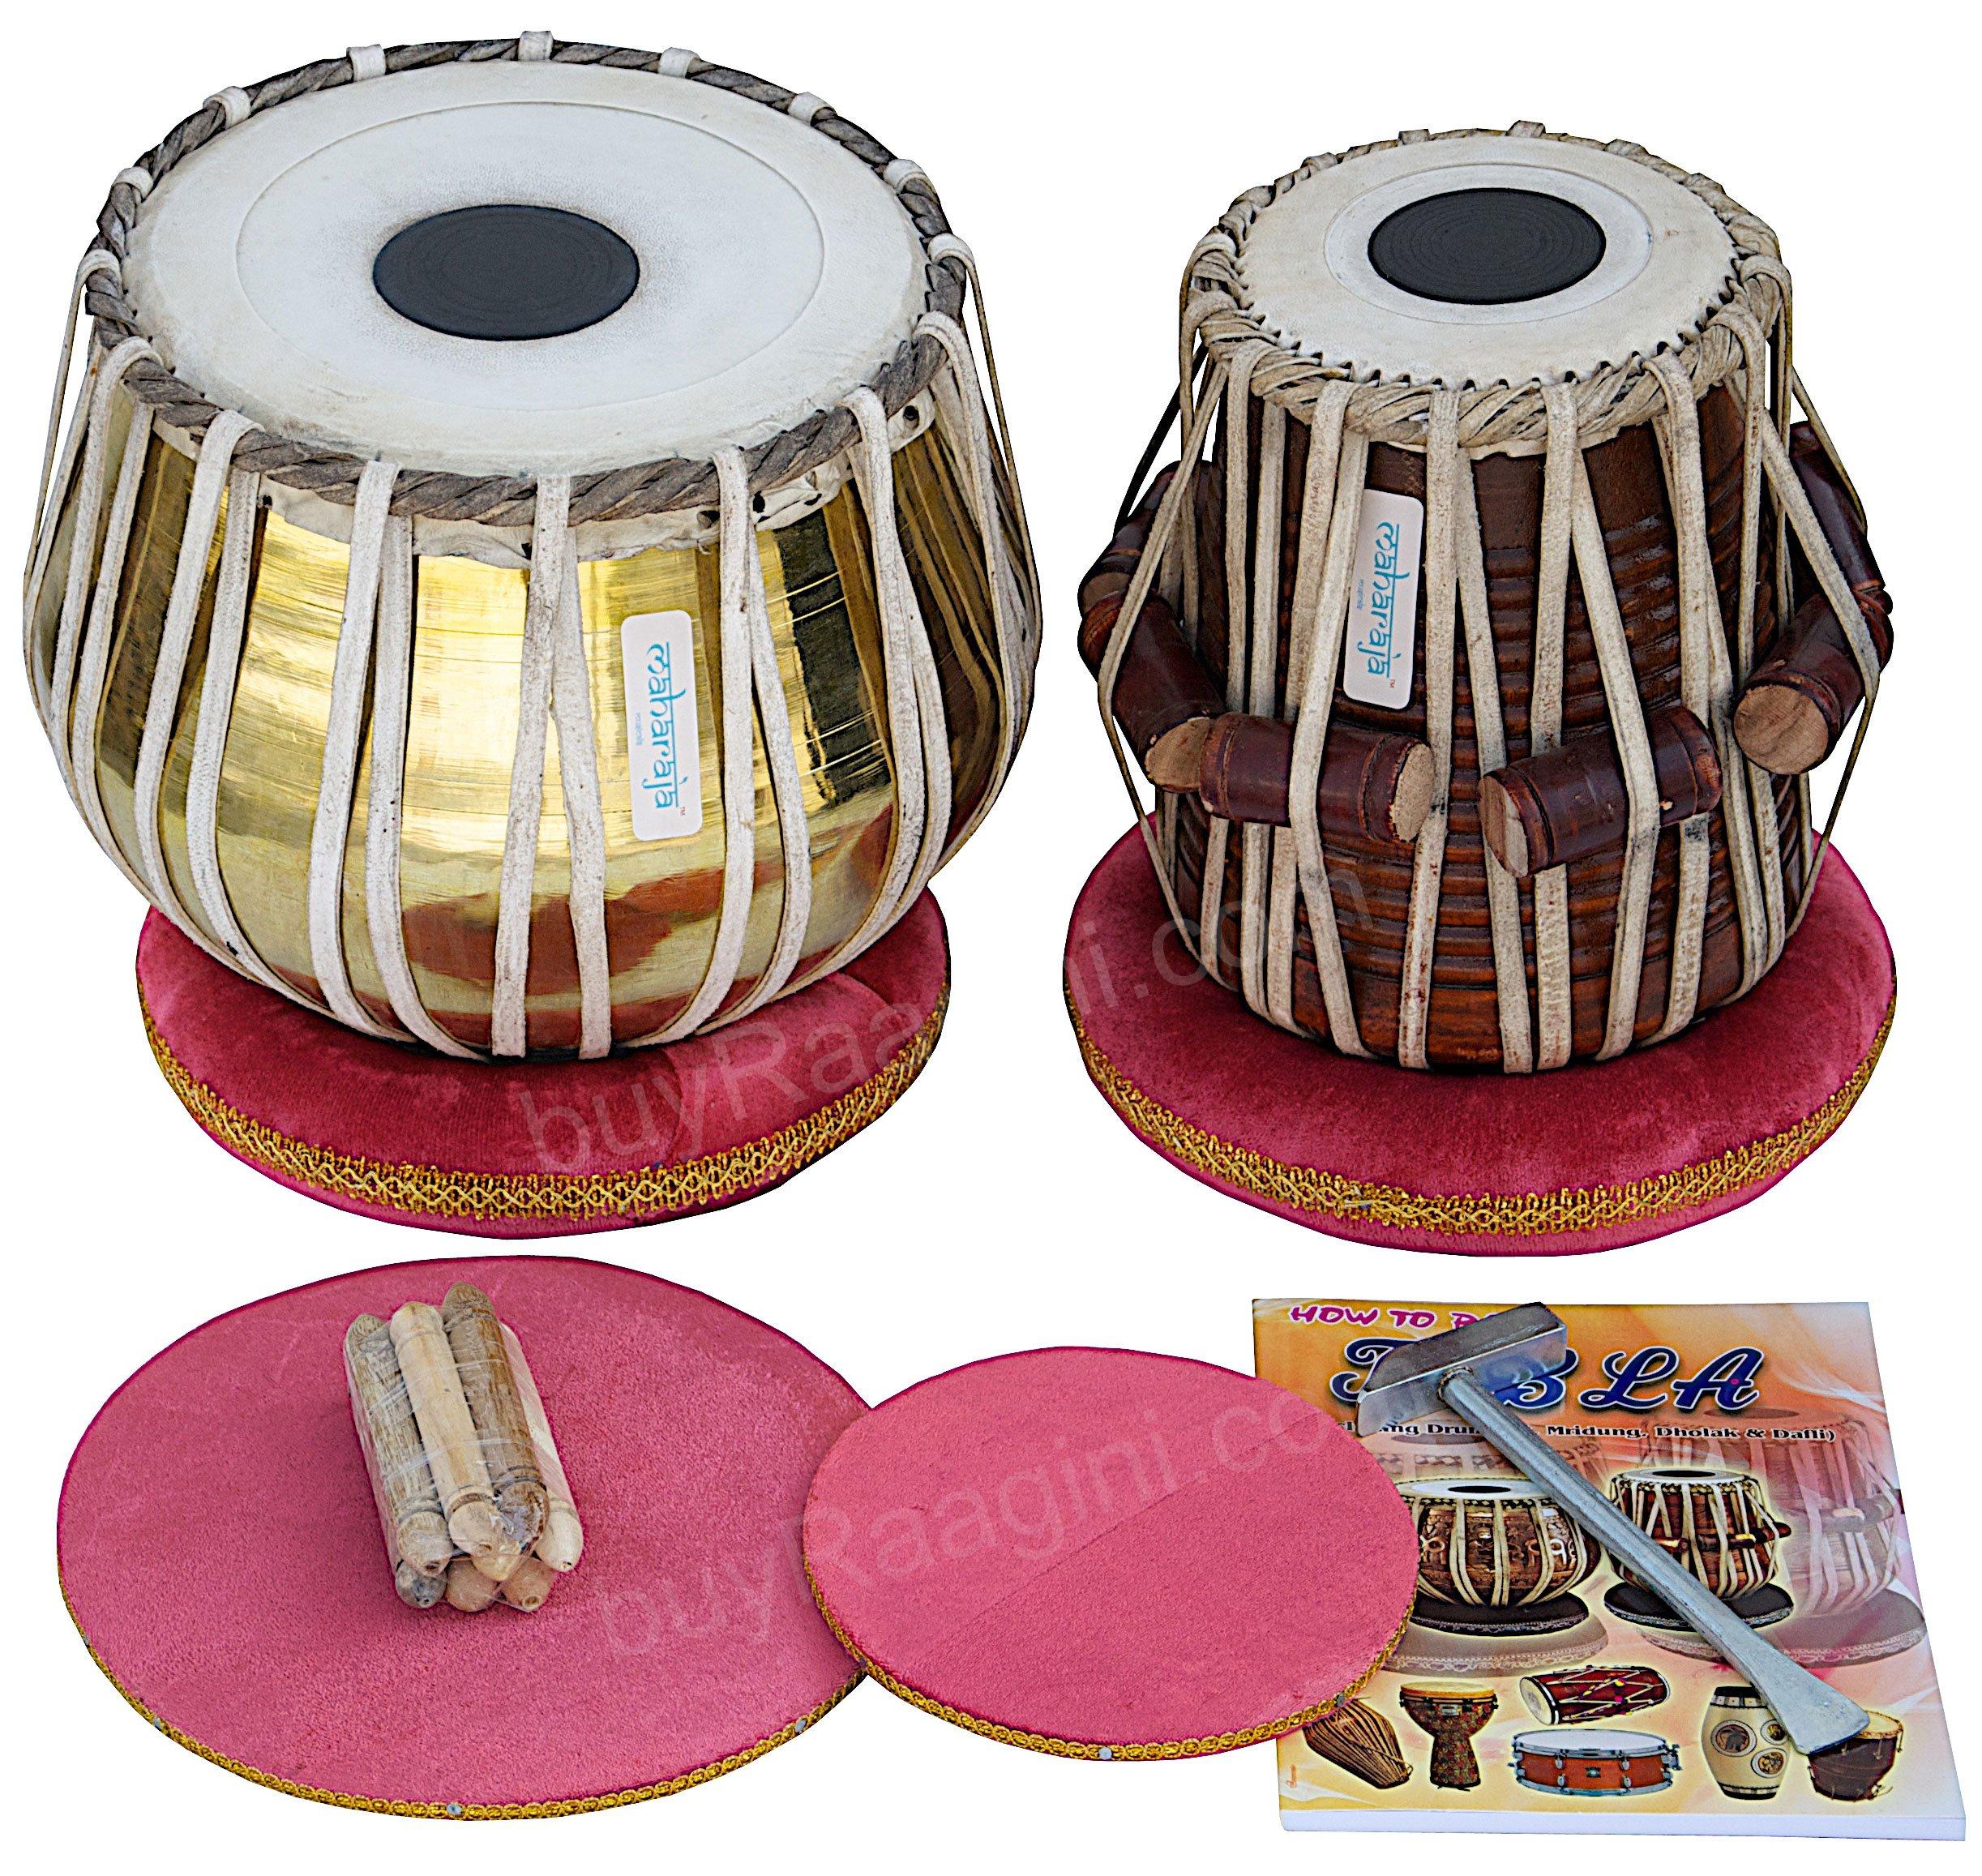 Tabla Set by Maharaja Musicals, Golden Brass Bayan 3Kg, Sheesham Dayan Tabla, Nylon Bag, Hammer, Book, Cushions, Cover, Tabla Indian Drums (PDI-CH) by Maharaja Musicals